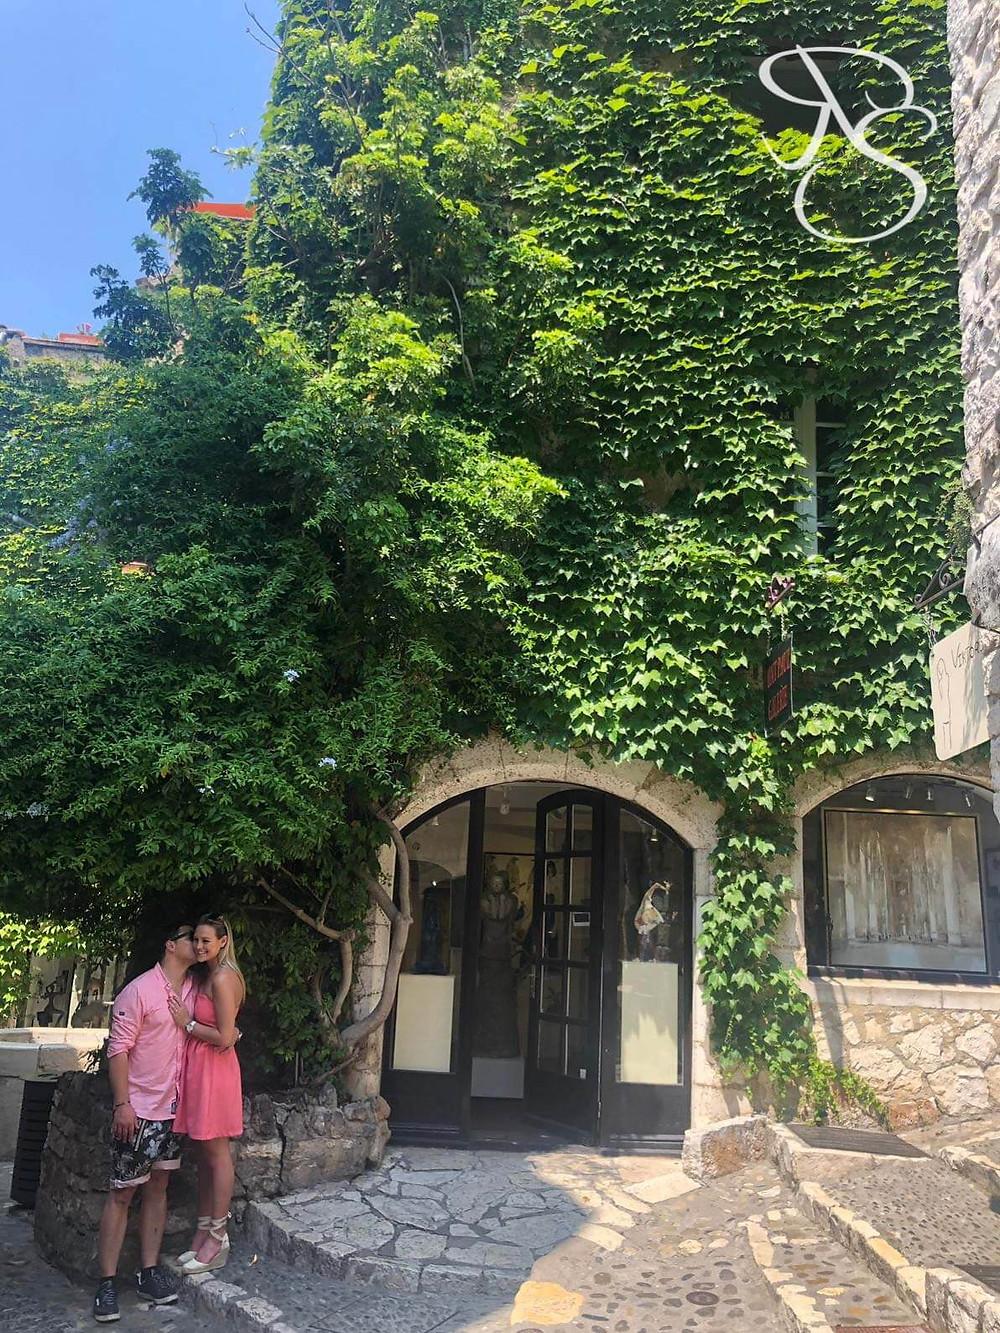 Romantic Proposal, exclusive private tours with Riviera Secrets